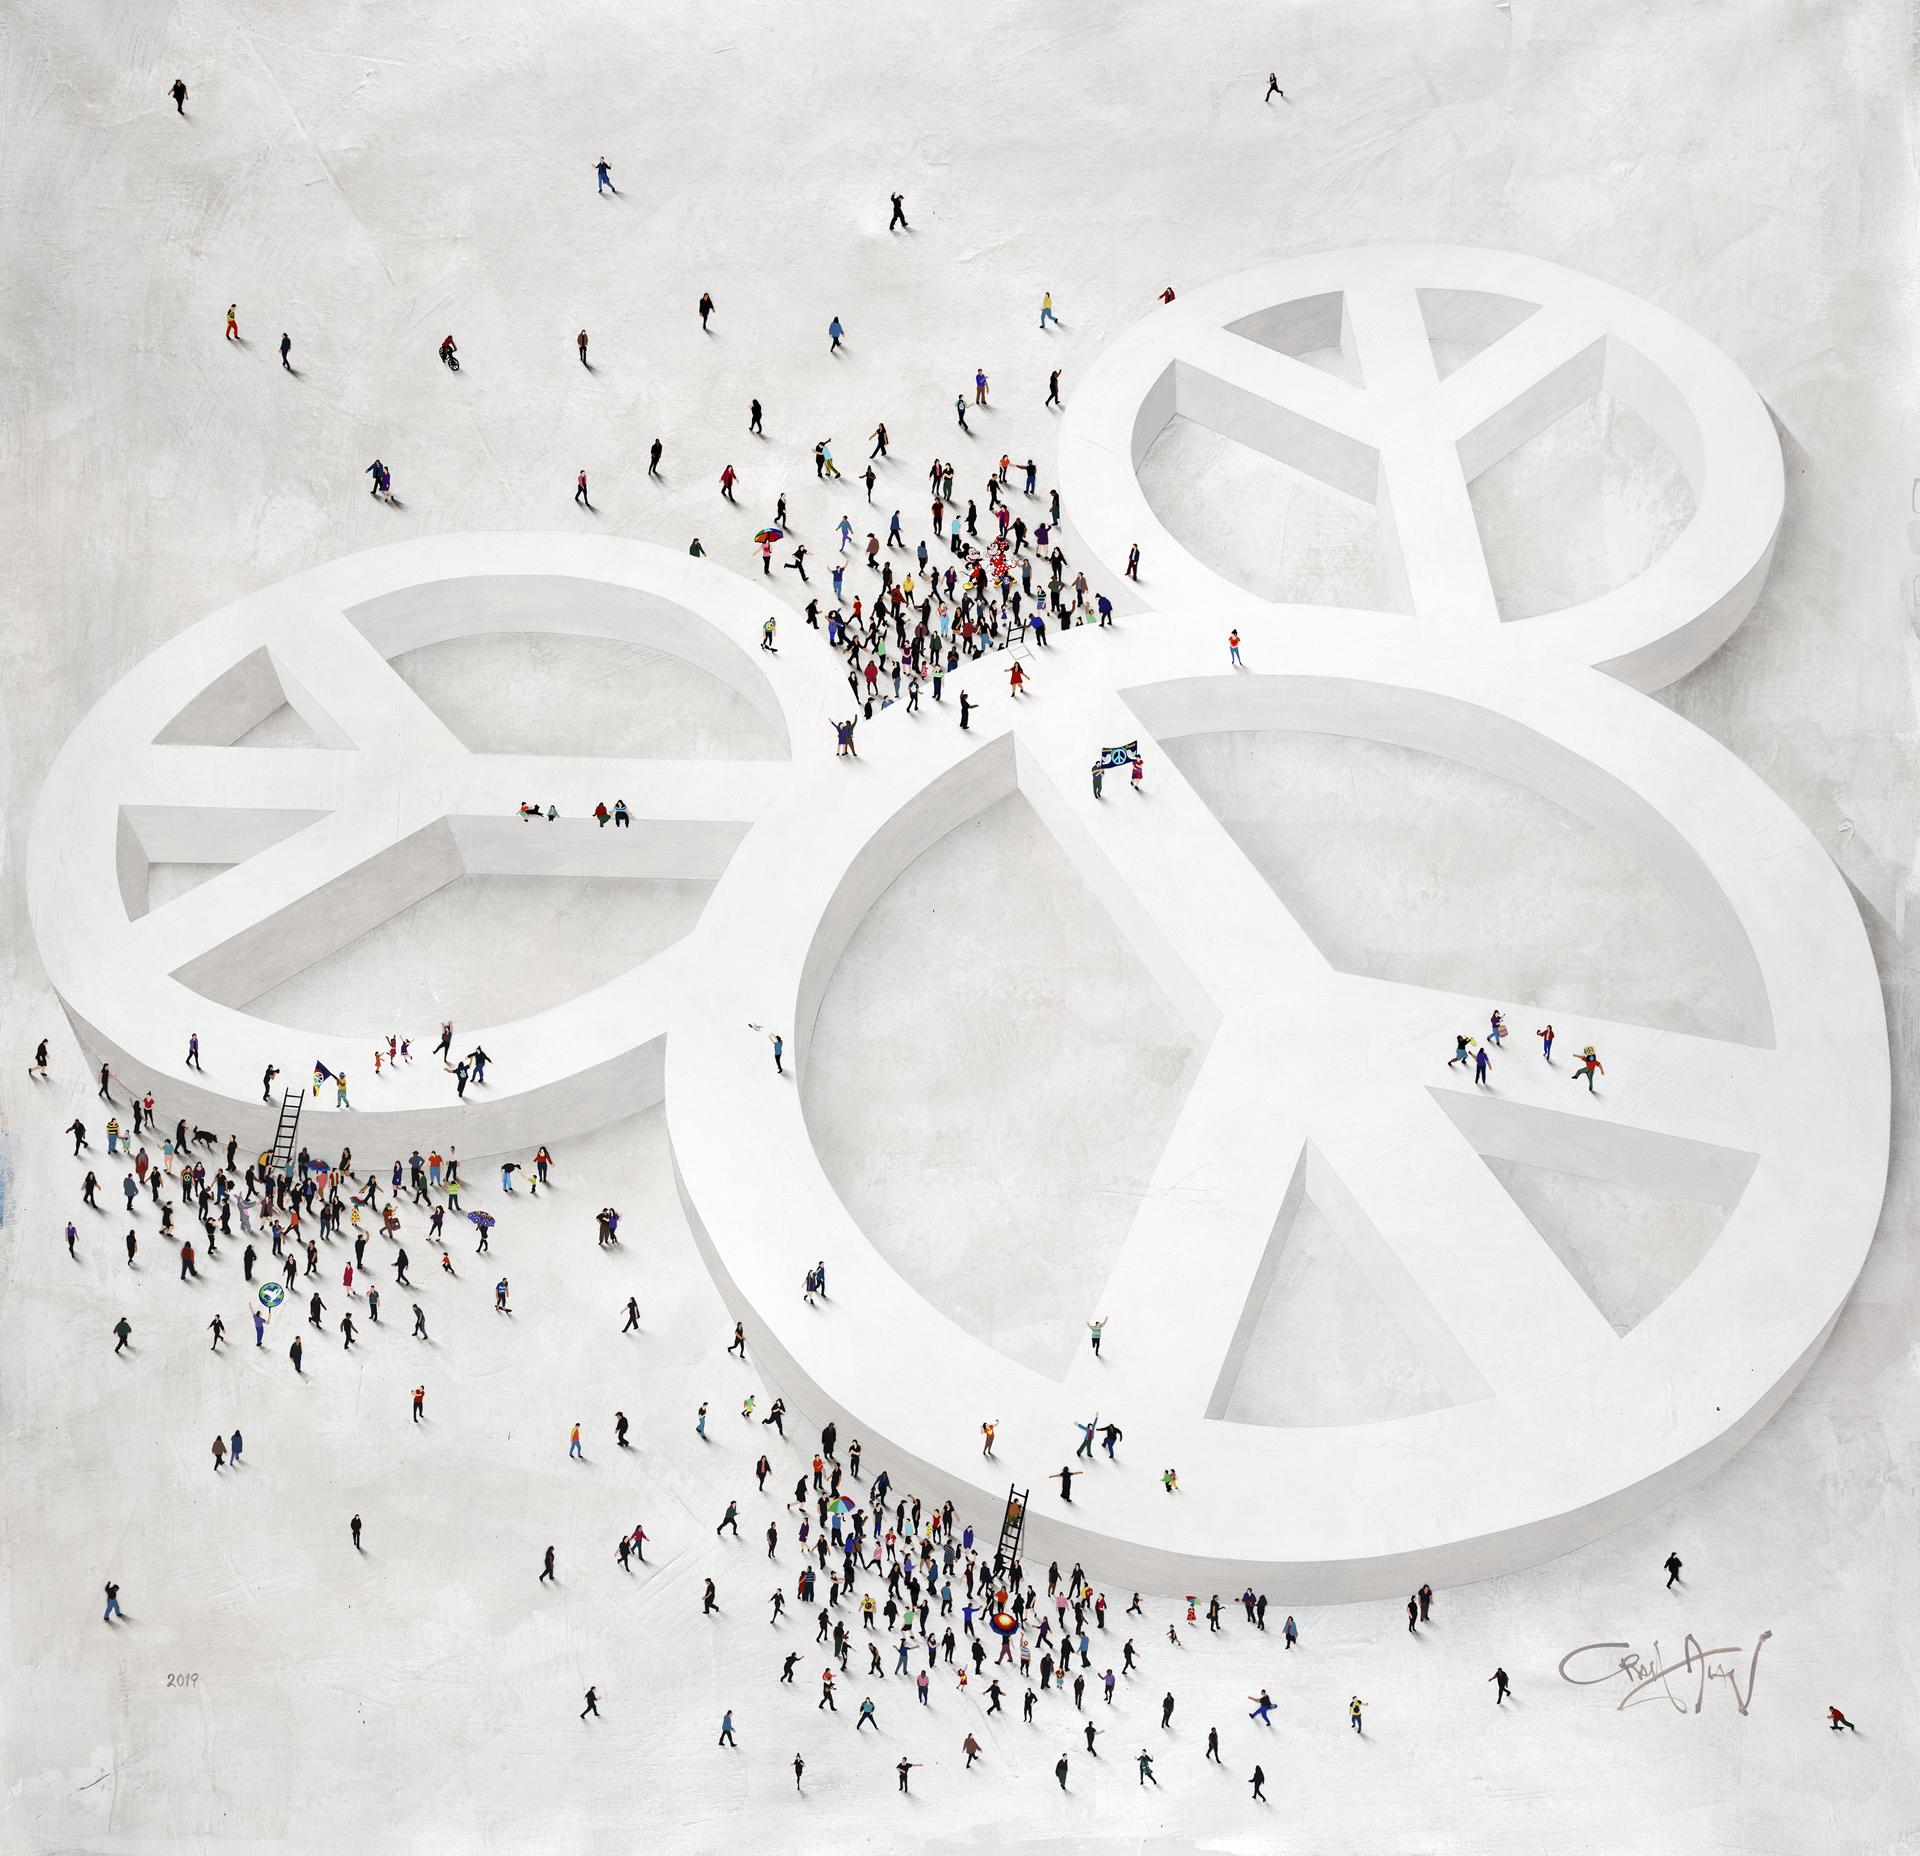 Platform for Peace by Craig Alan